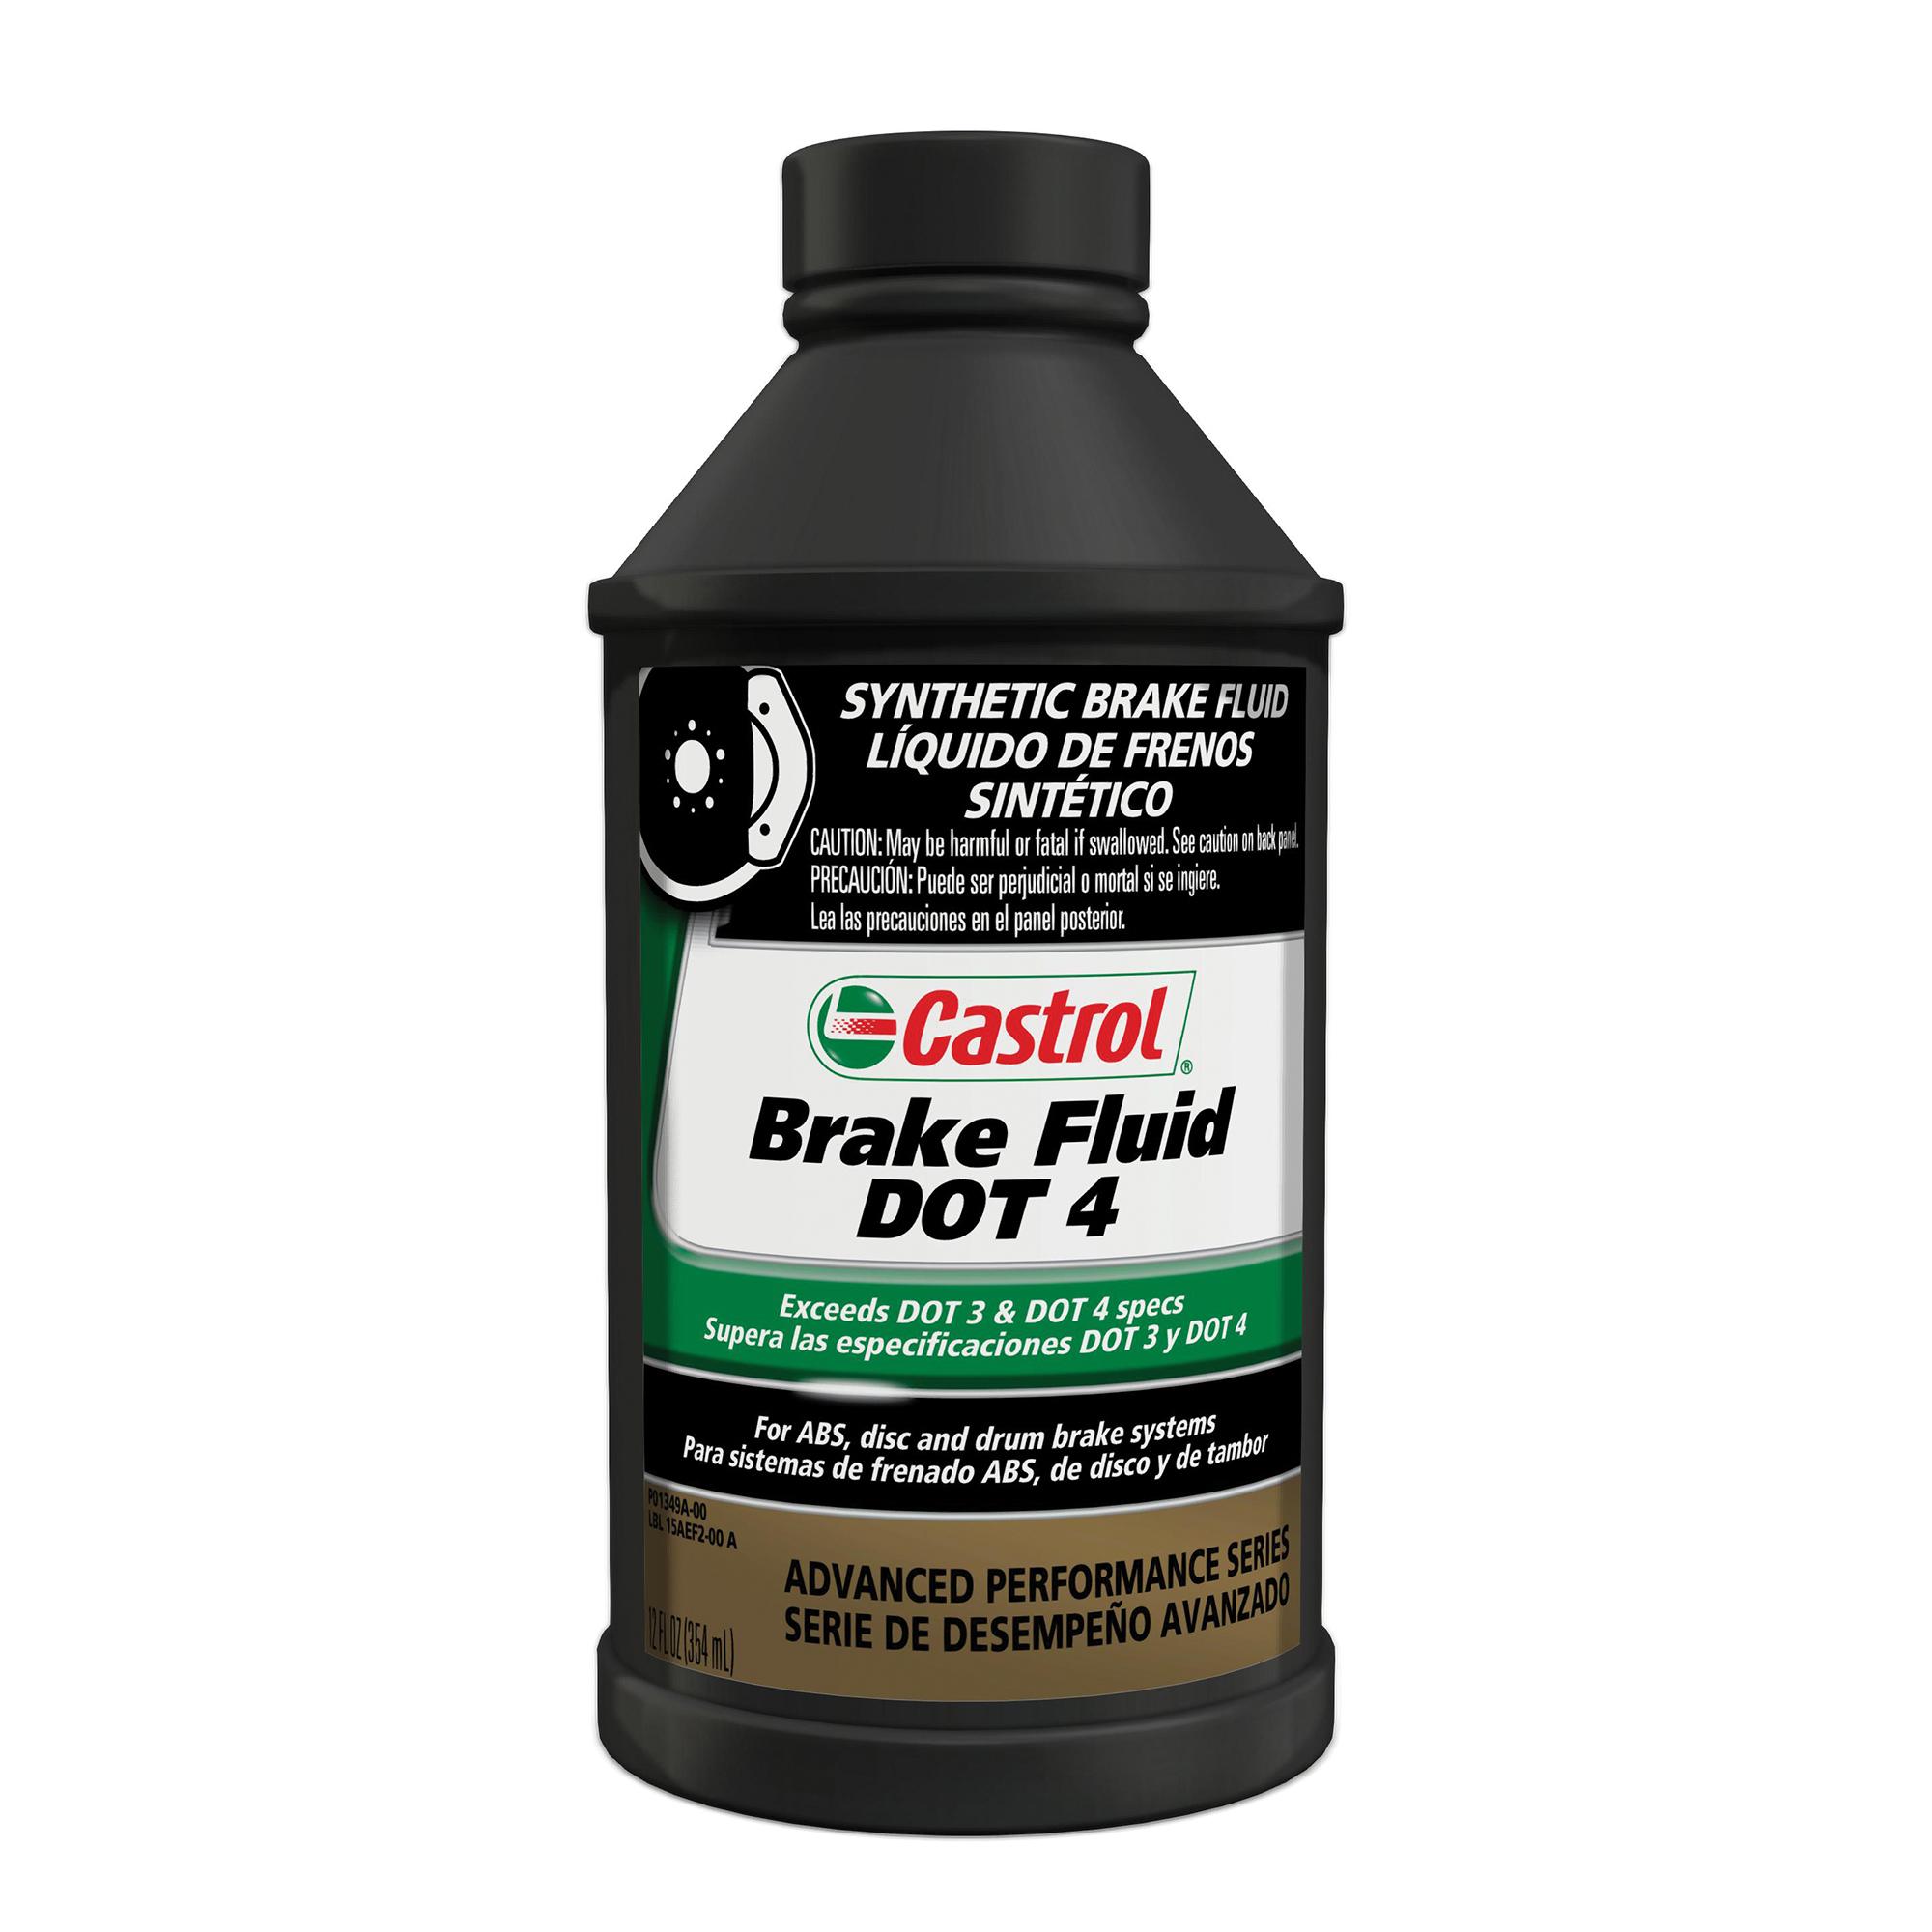 Castrol Brake Fluid DOT 4, 12 OZ